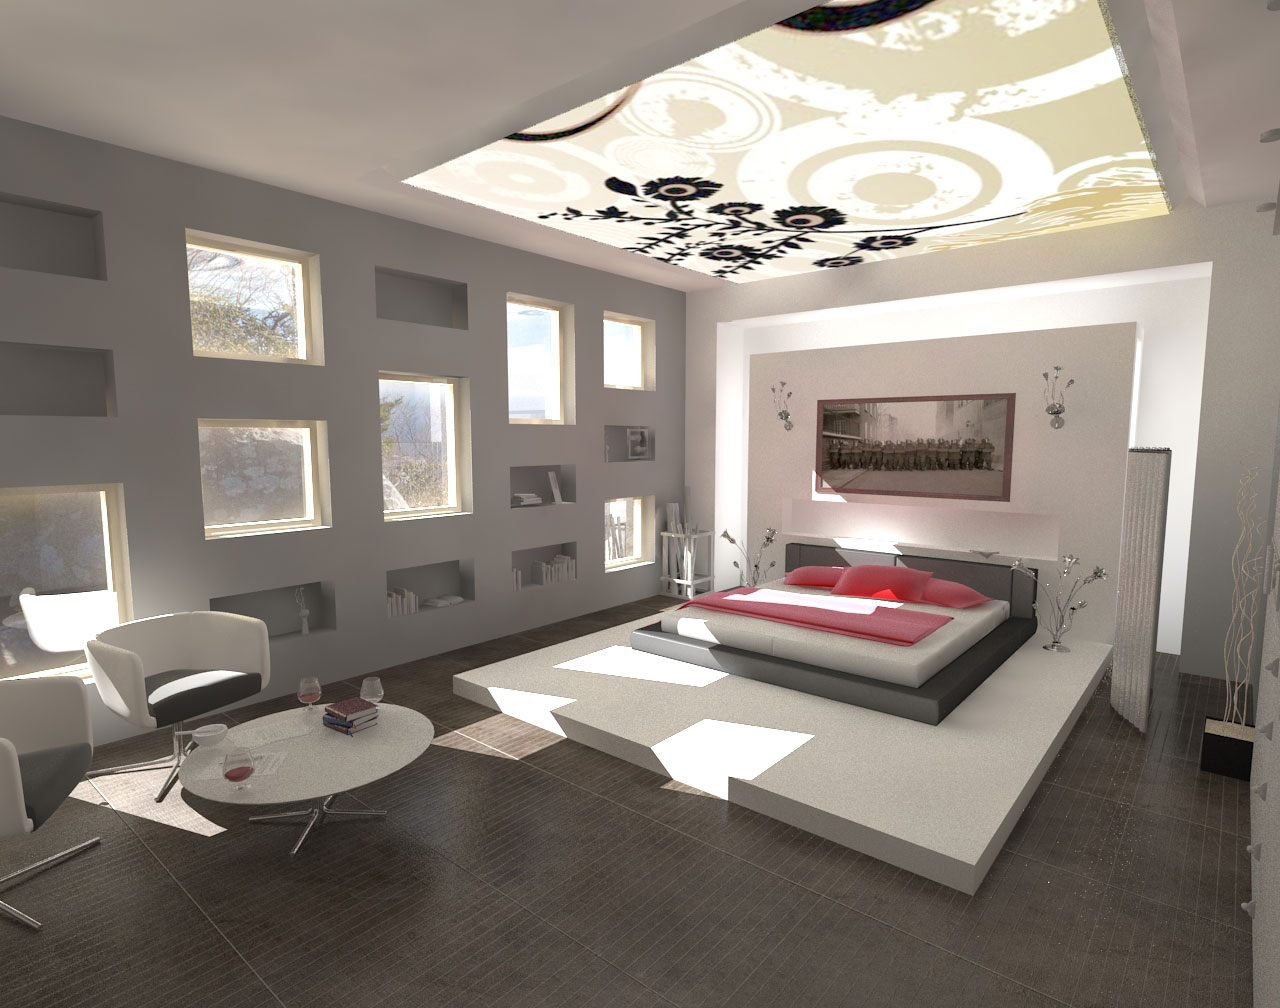 Decorations: Minimalist Design - Modern Bedroom Interior ... on Bedroom Minimalist Design Ideas  id=35427